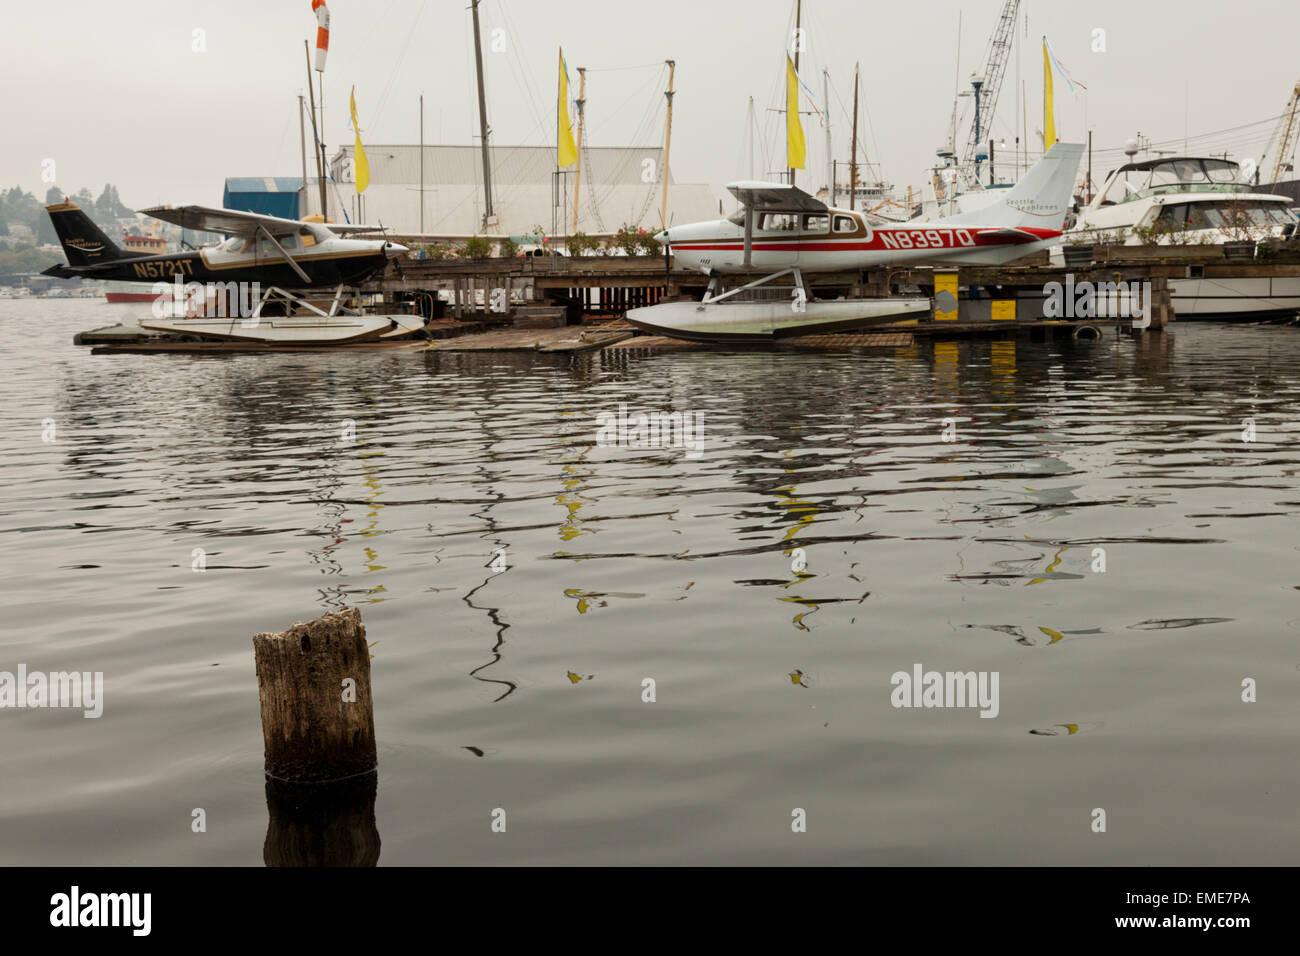 Seaplanes on Lake Union Seattle Washington USA - Stock Image